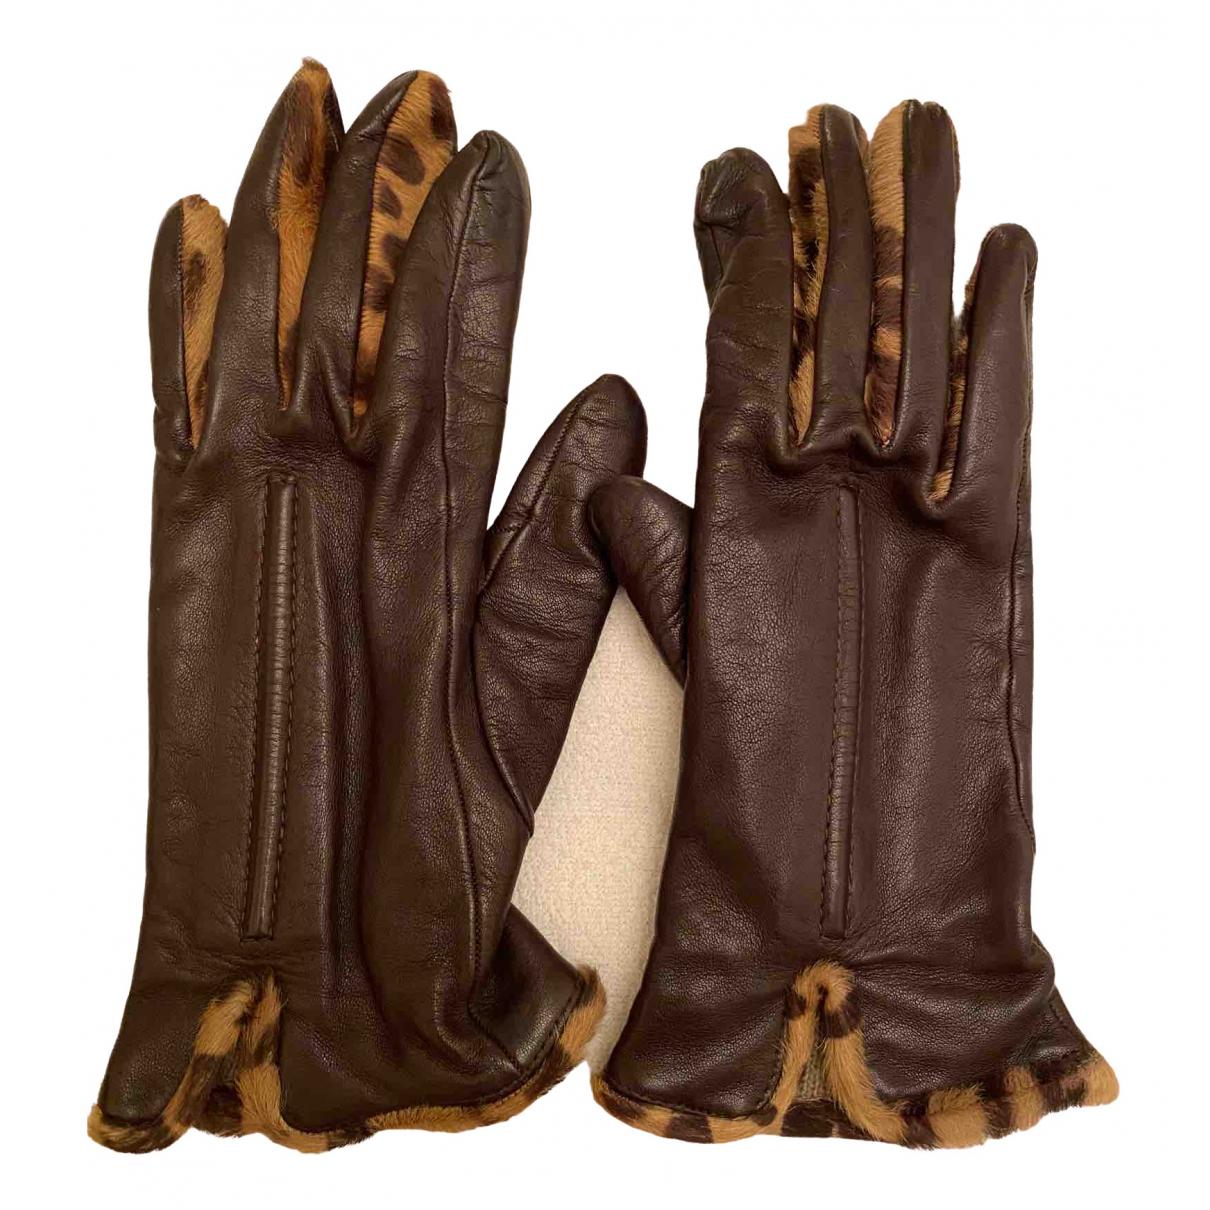 Sermoneta Gloves \N Brown Leather Gloves for Women 7 Inches